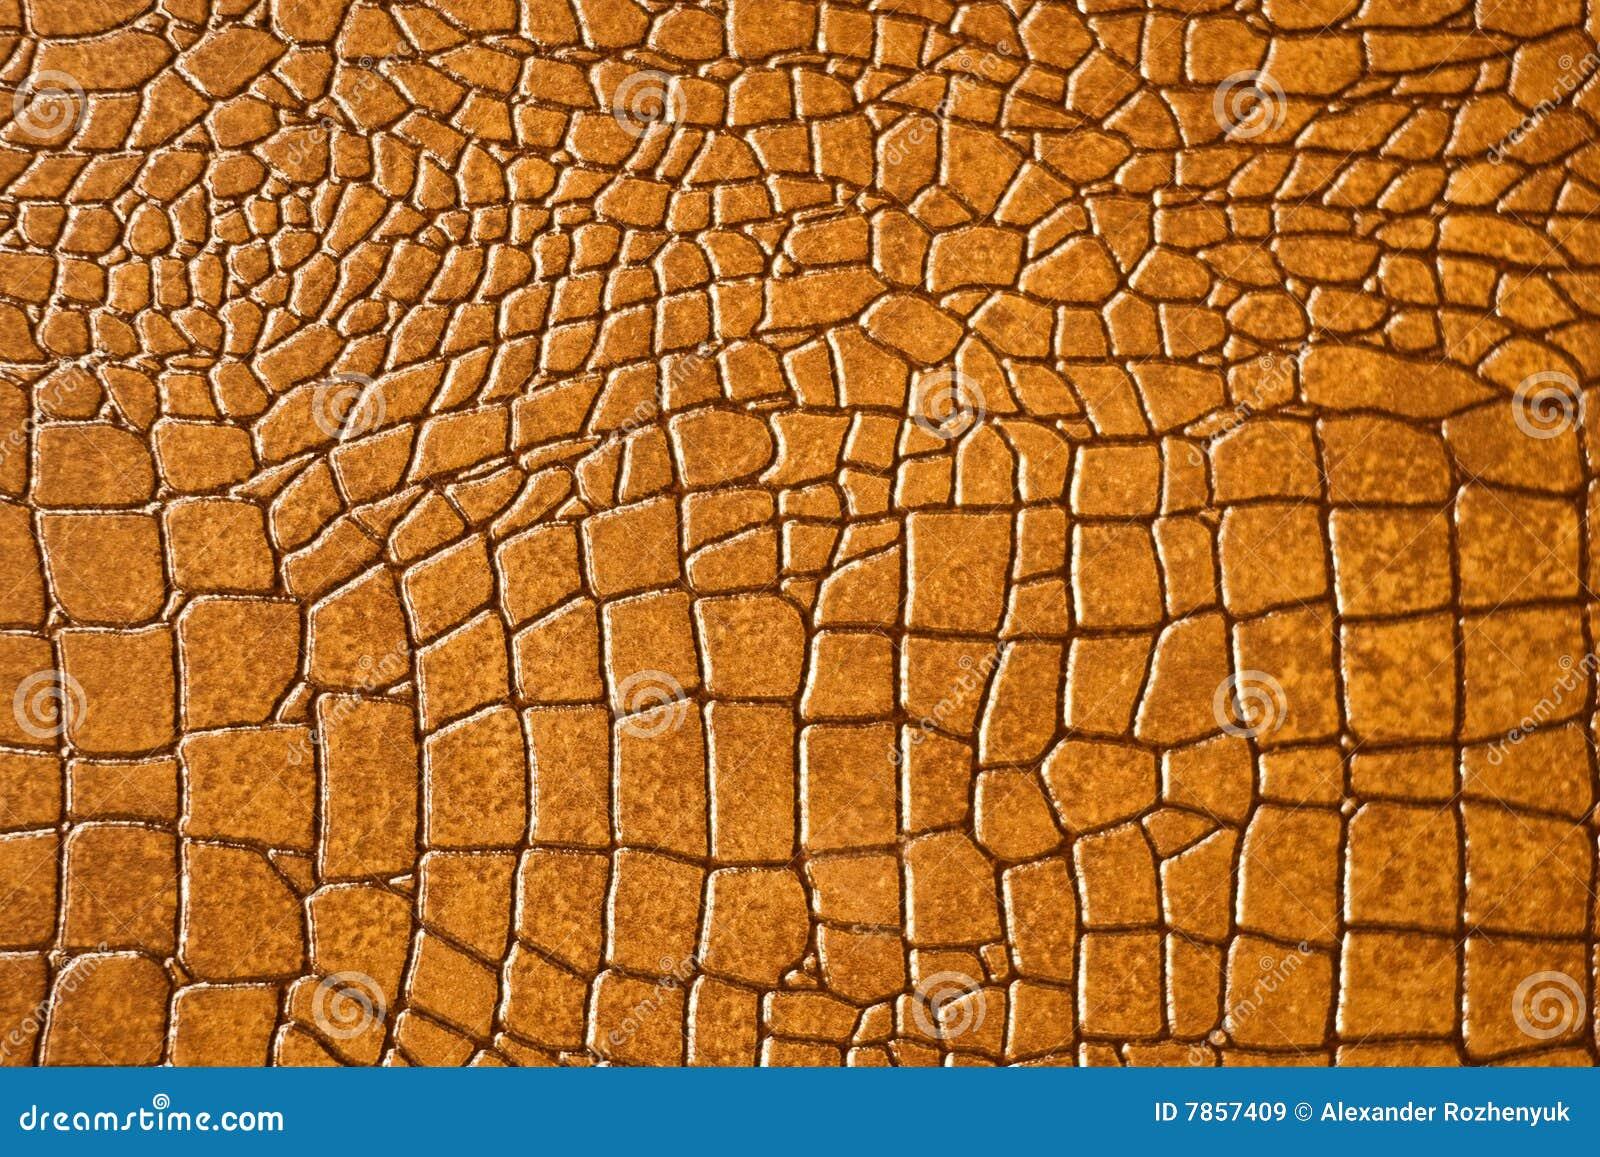 Brown snakeskin or crocodile texture